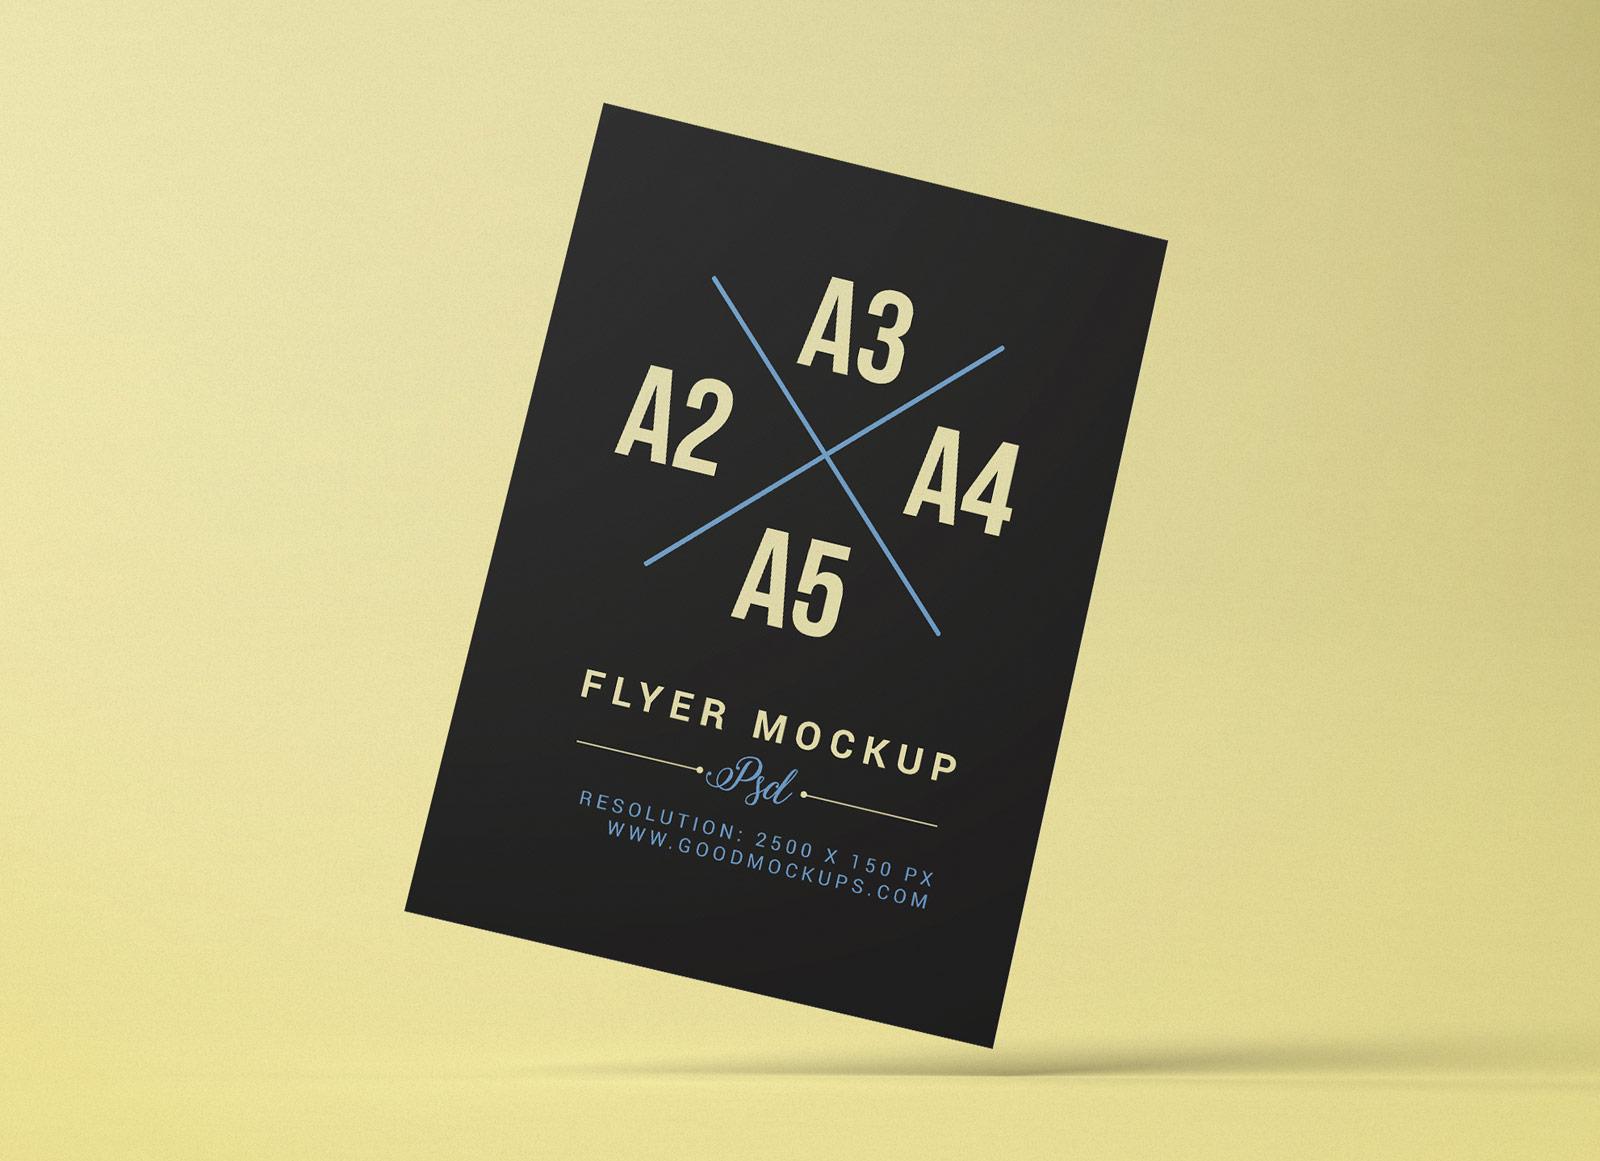 Free-A2-A3-A4-A5-Flyer-Mockup-PSD-File